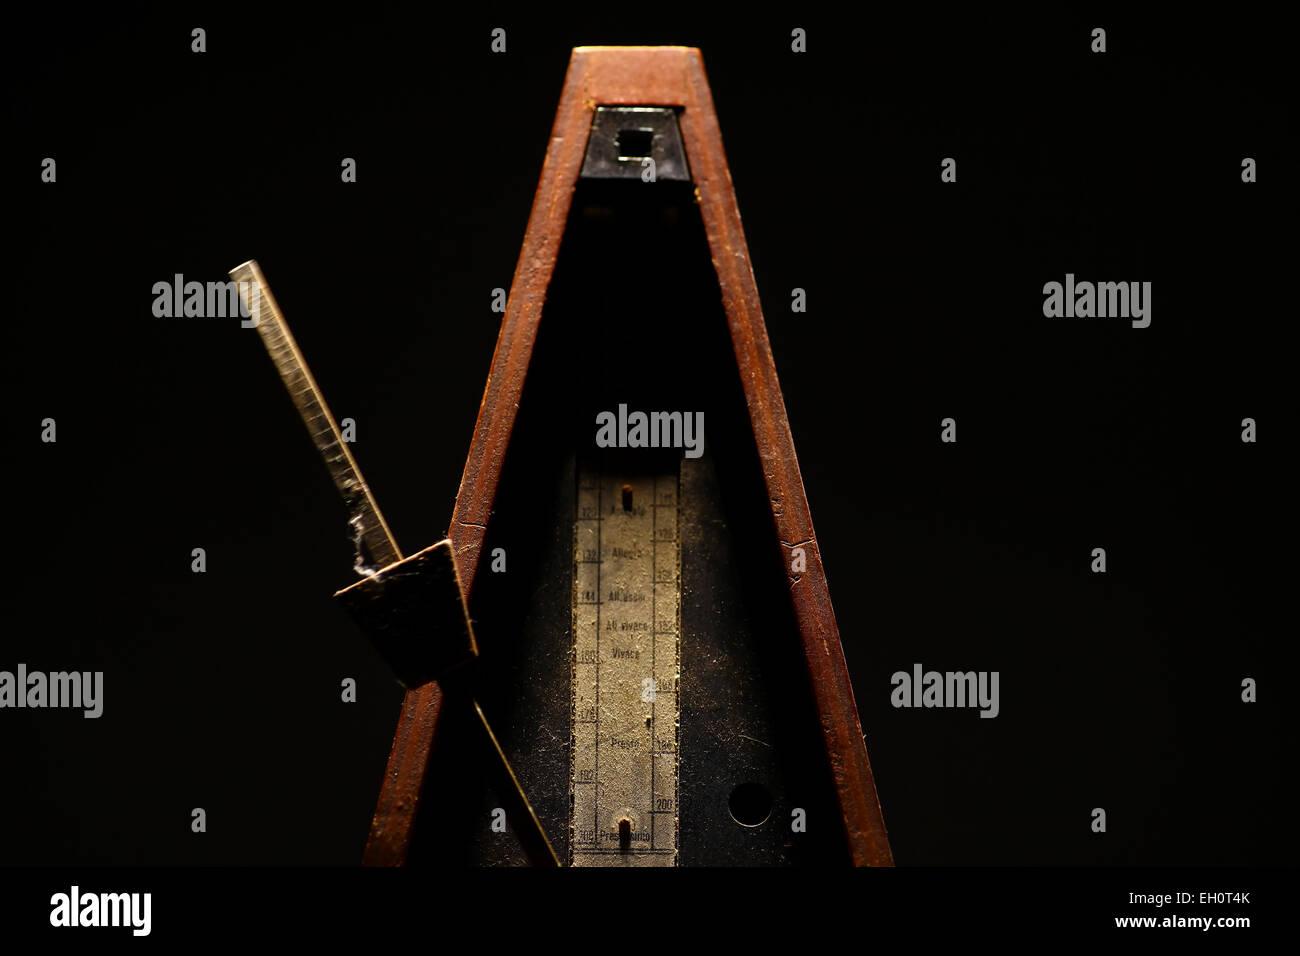 Horizontal shot of a vintage metronome, on a black background. - Stock Image